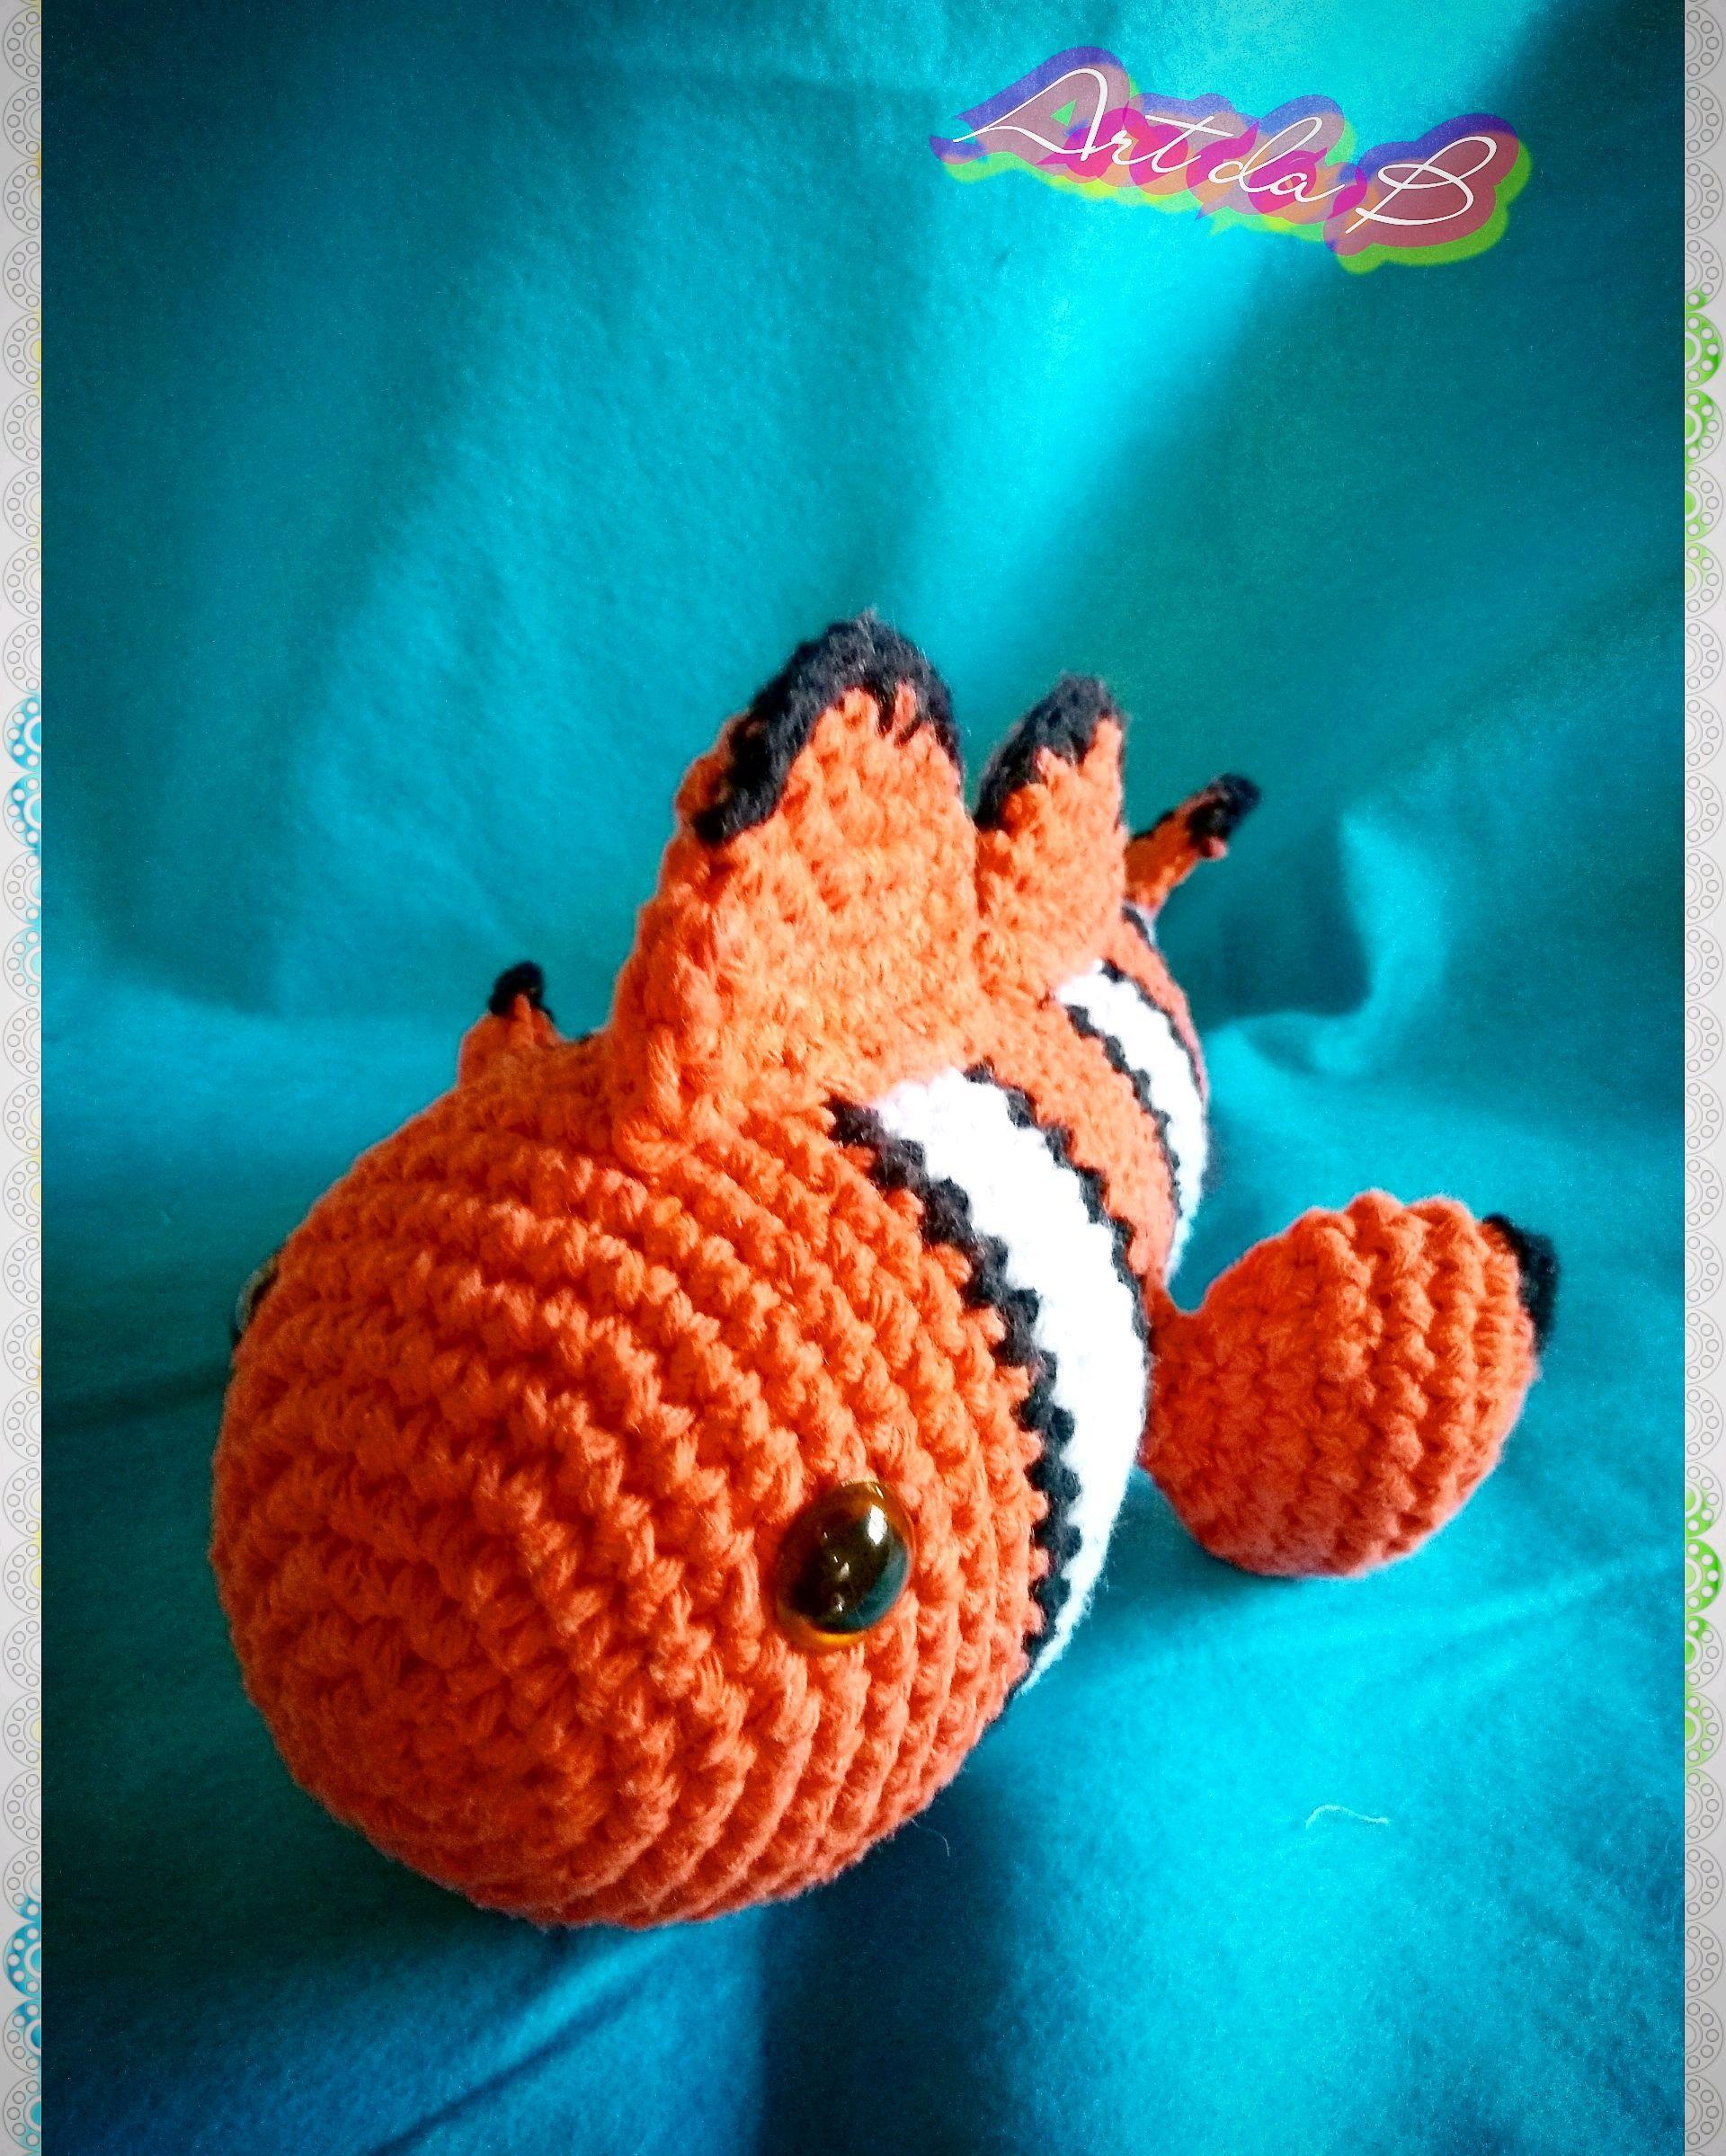 Nemo o pez payaso amigurumi tejido a crochet (Nemo clown fish ... | 2399x1920